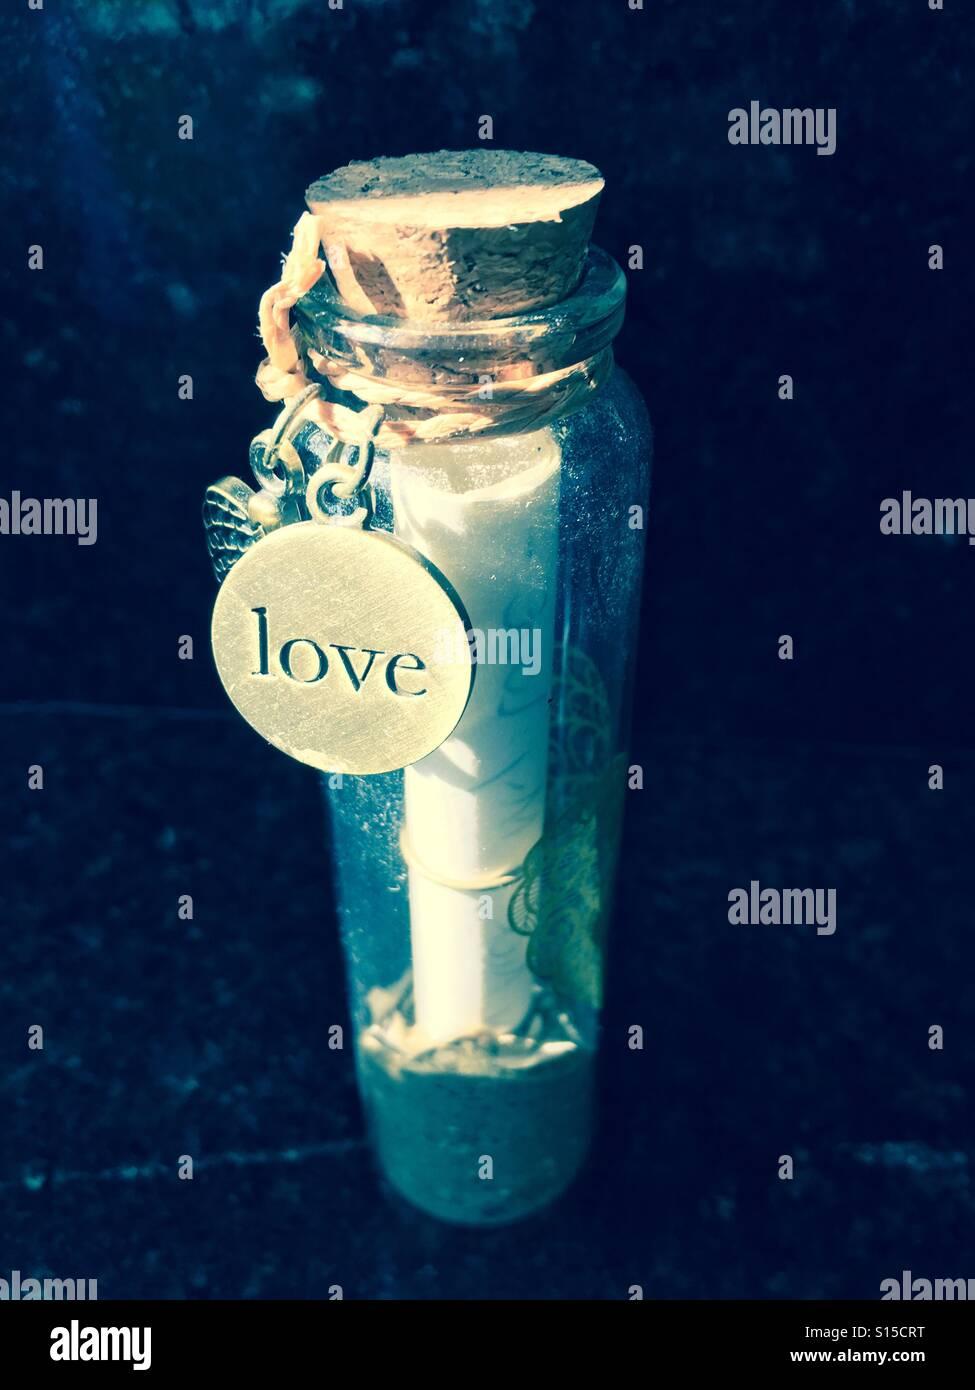 Love Letter in a Bottle - Stock Image